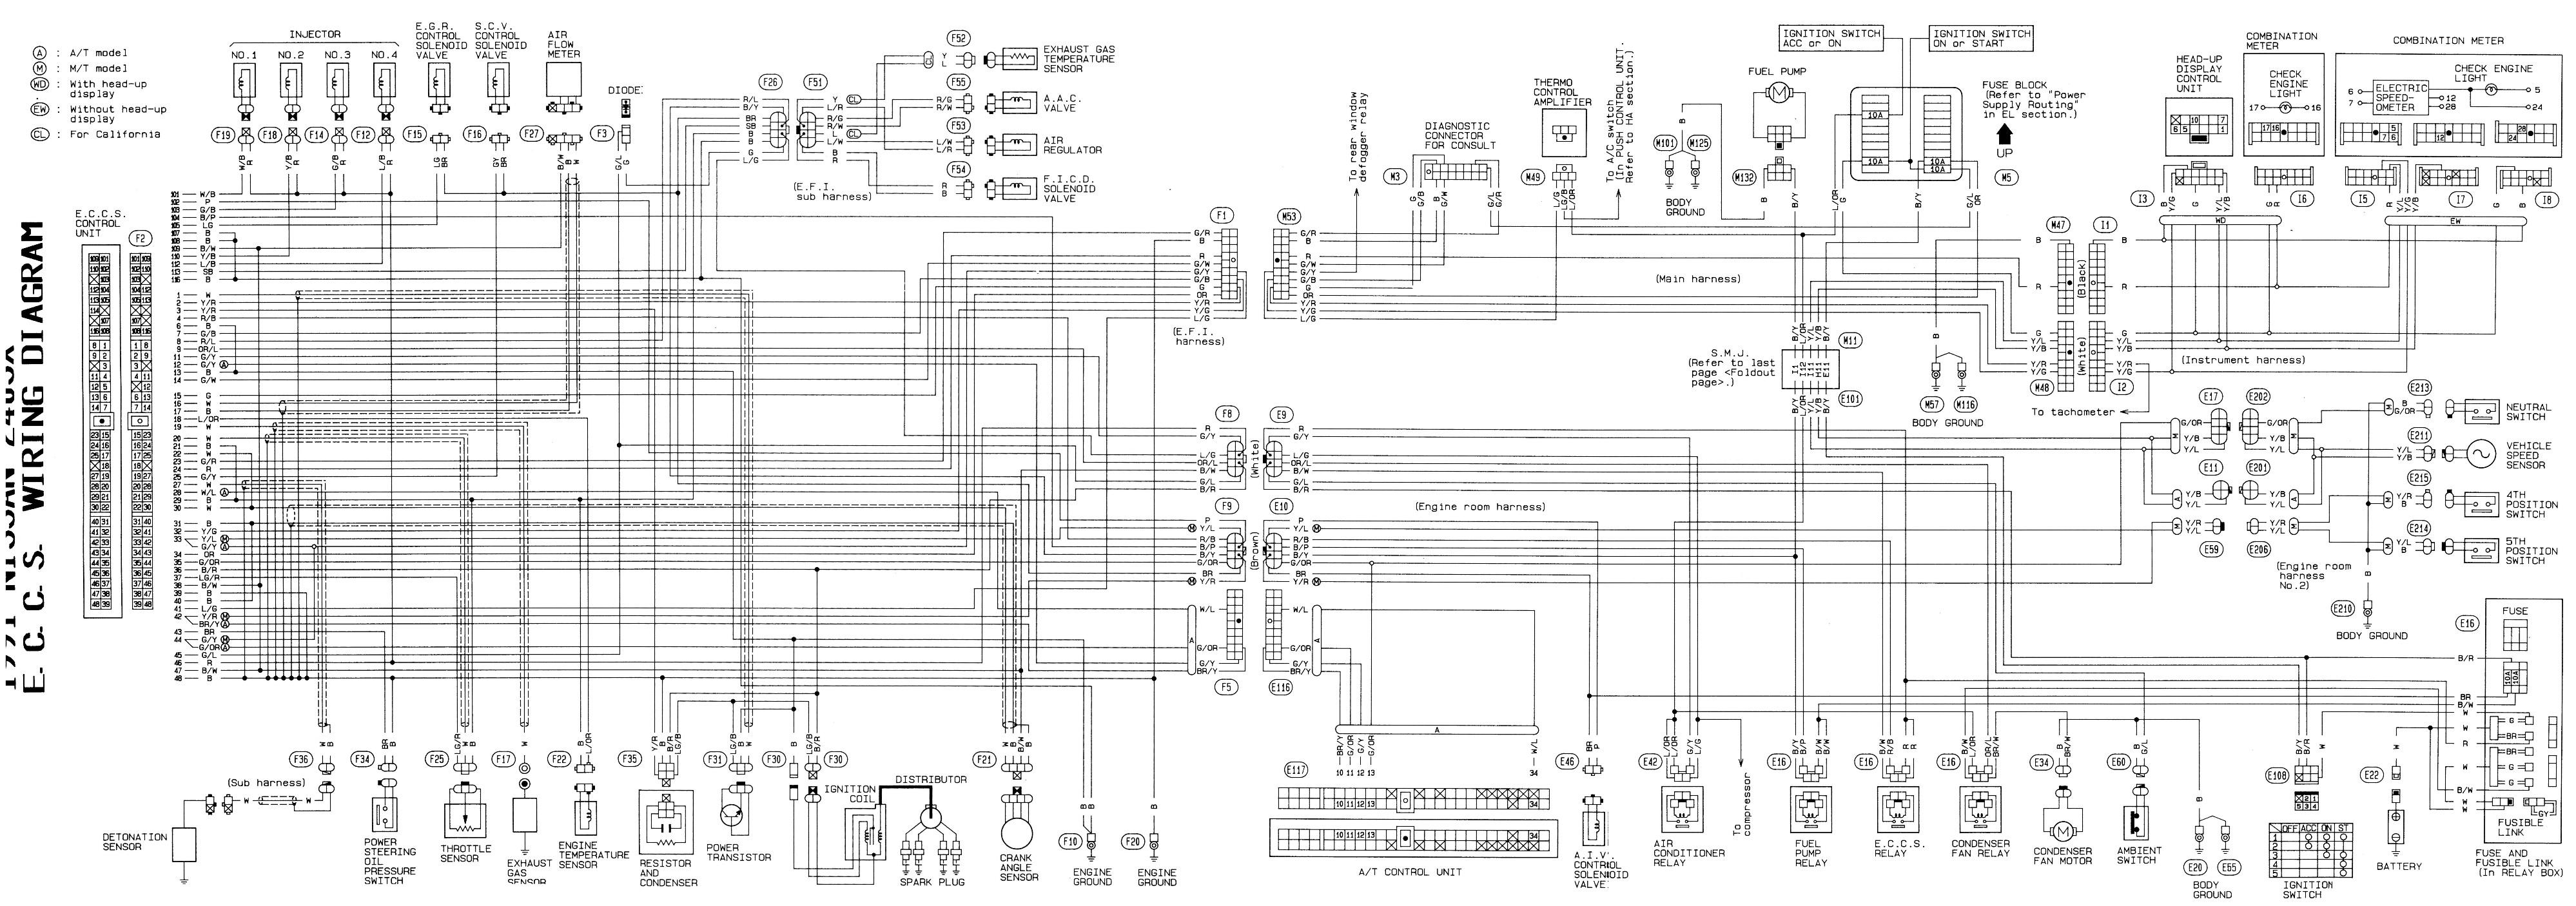 300zx Engine Harness Diagram S14 Ka24de Wiring Harness Diagram 1990 Nissan 240sx Engine Wiring Of 300zx Engine Harness Diagram